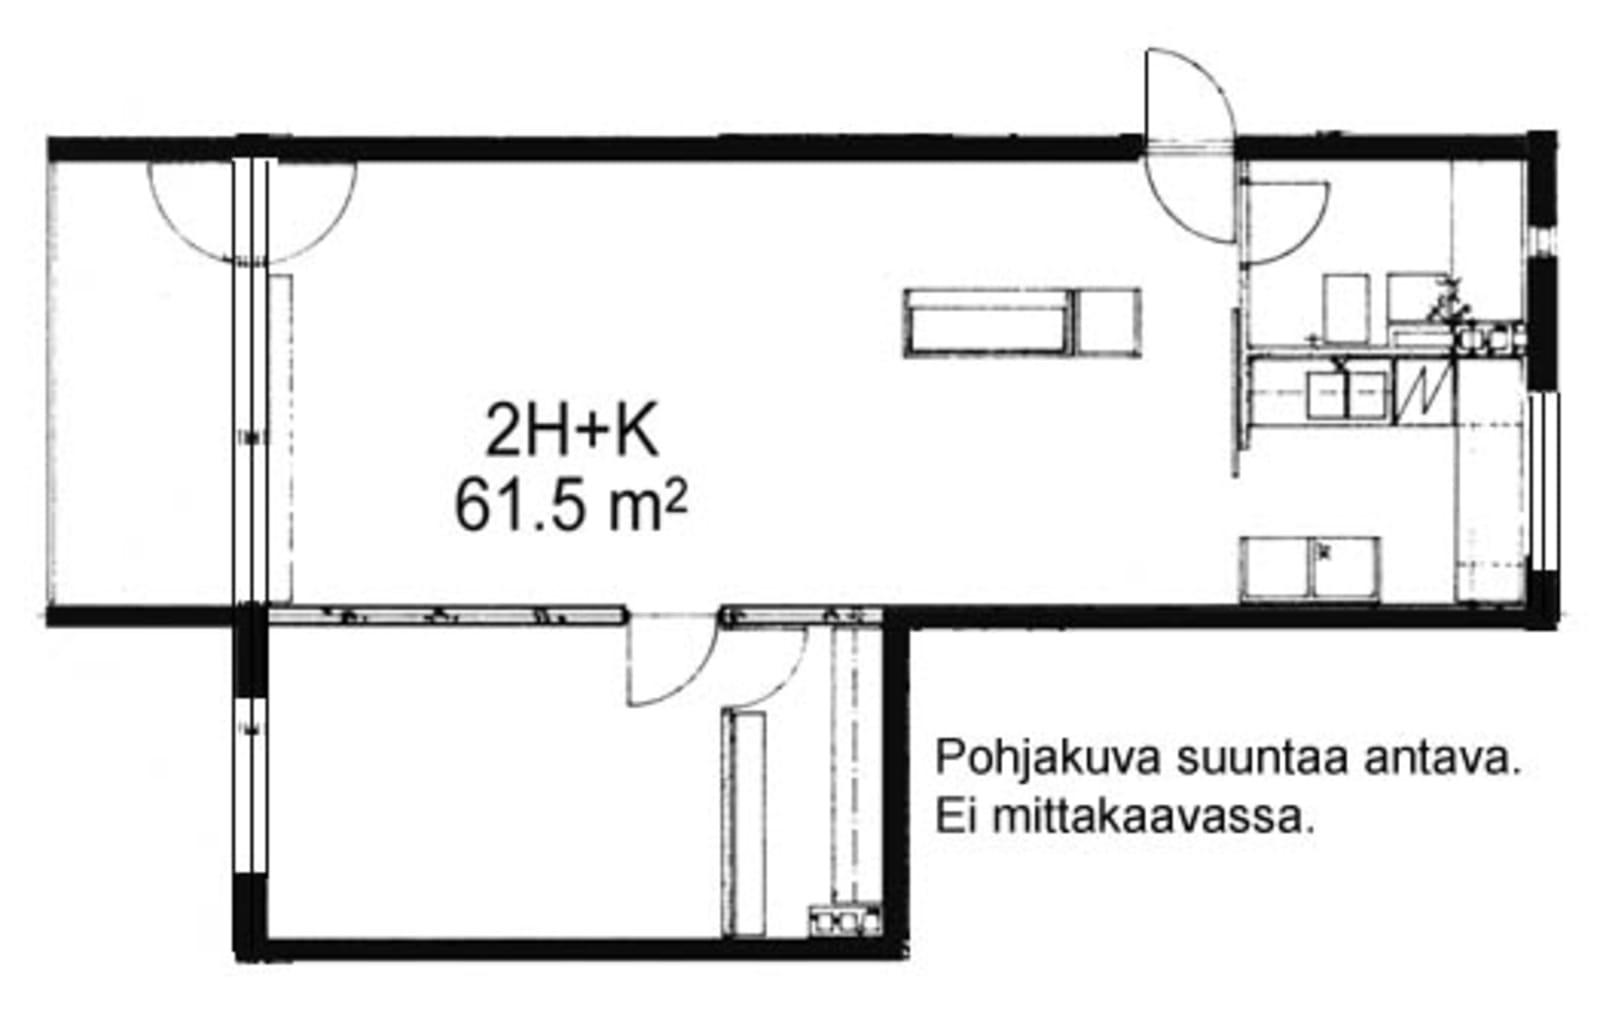 Oulu, Kaukovainio, Tuulihaukantie 9 A 012